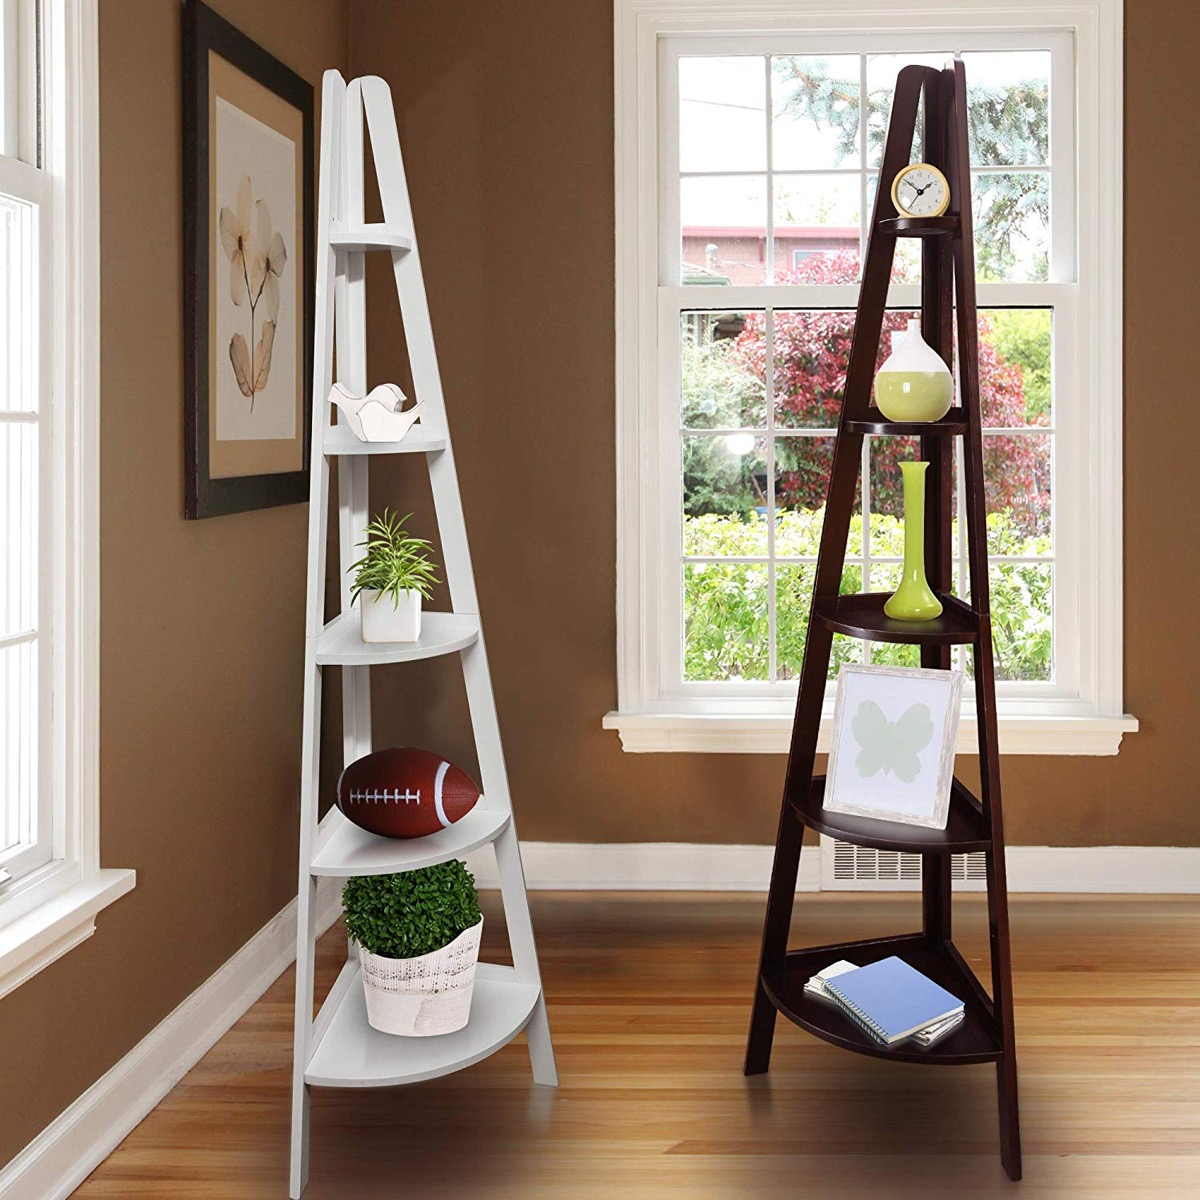 corner-ladder-shelf-design-five-tier-in-white-or-espresso-wood